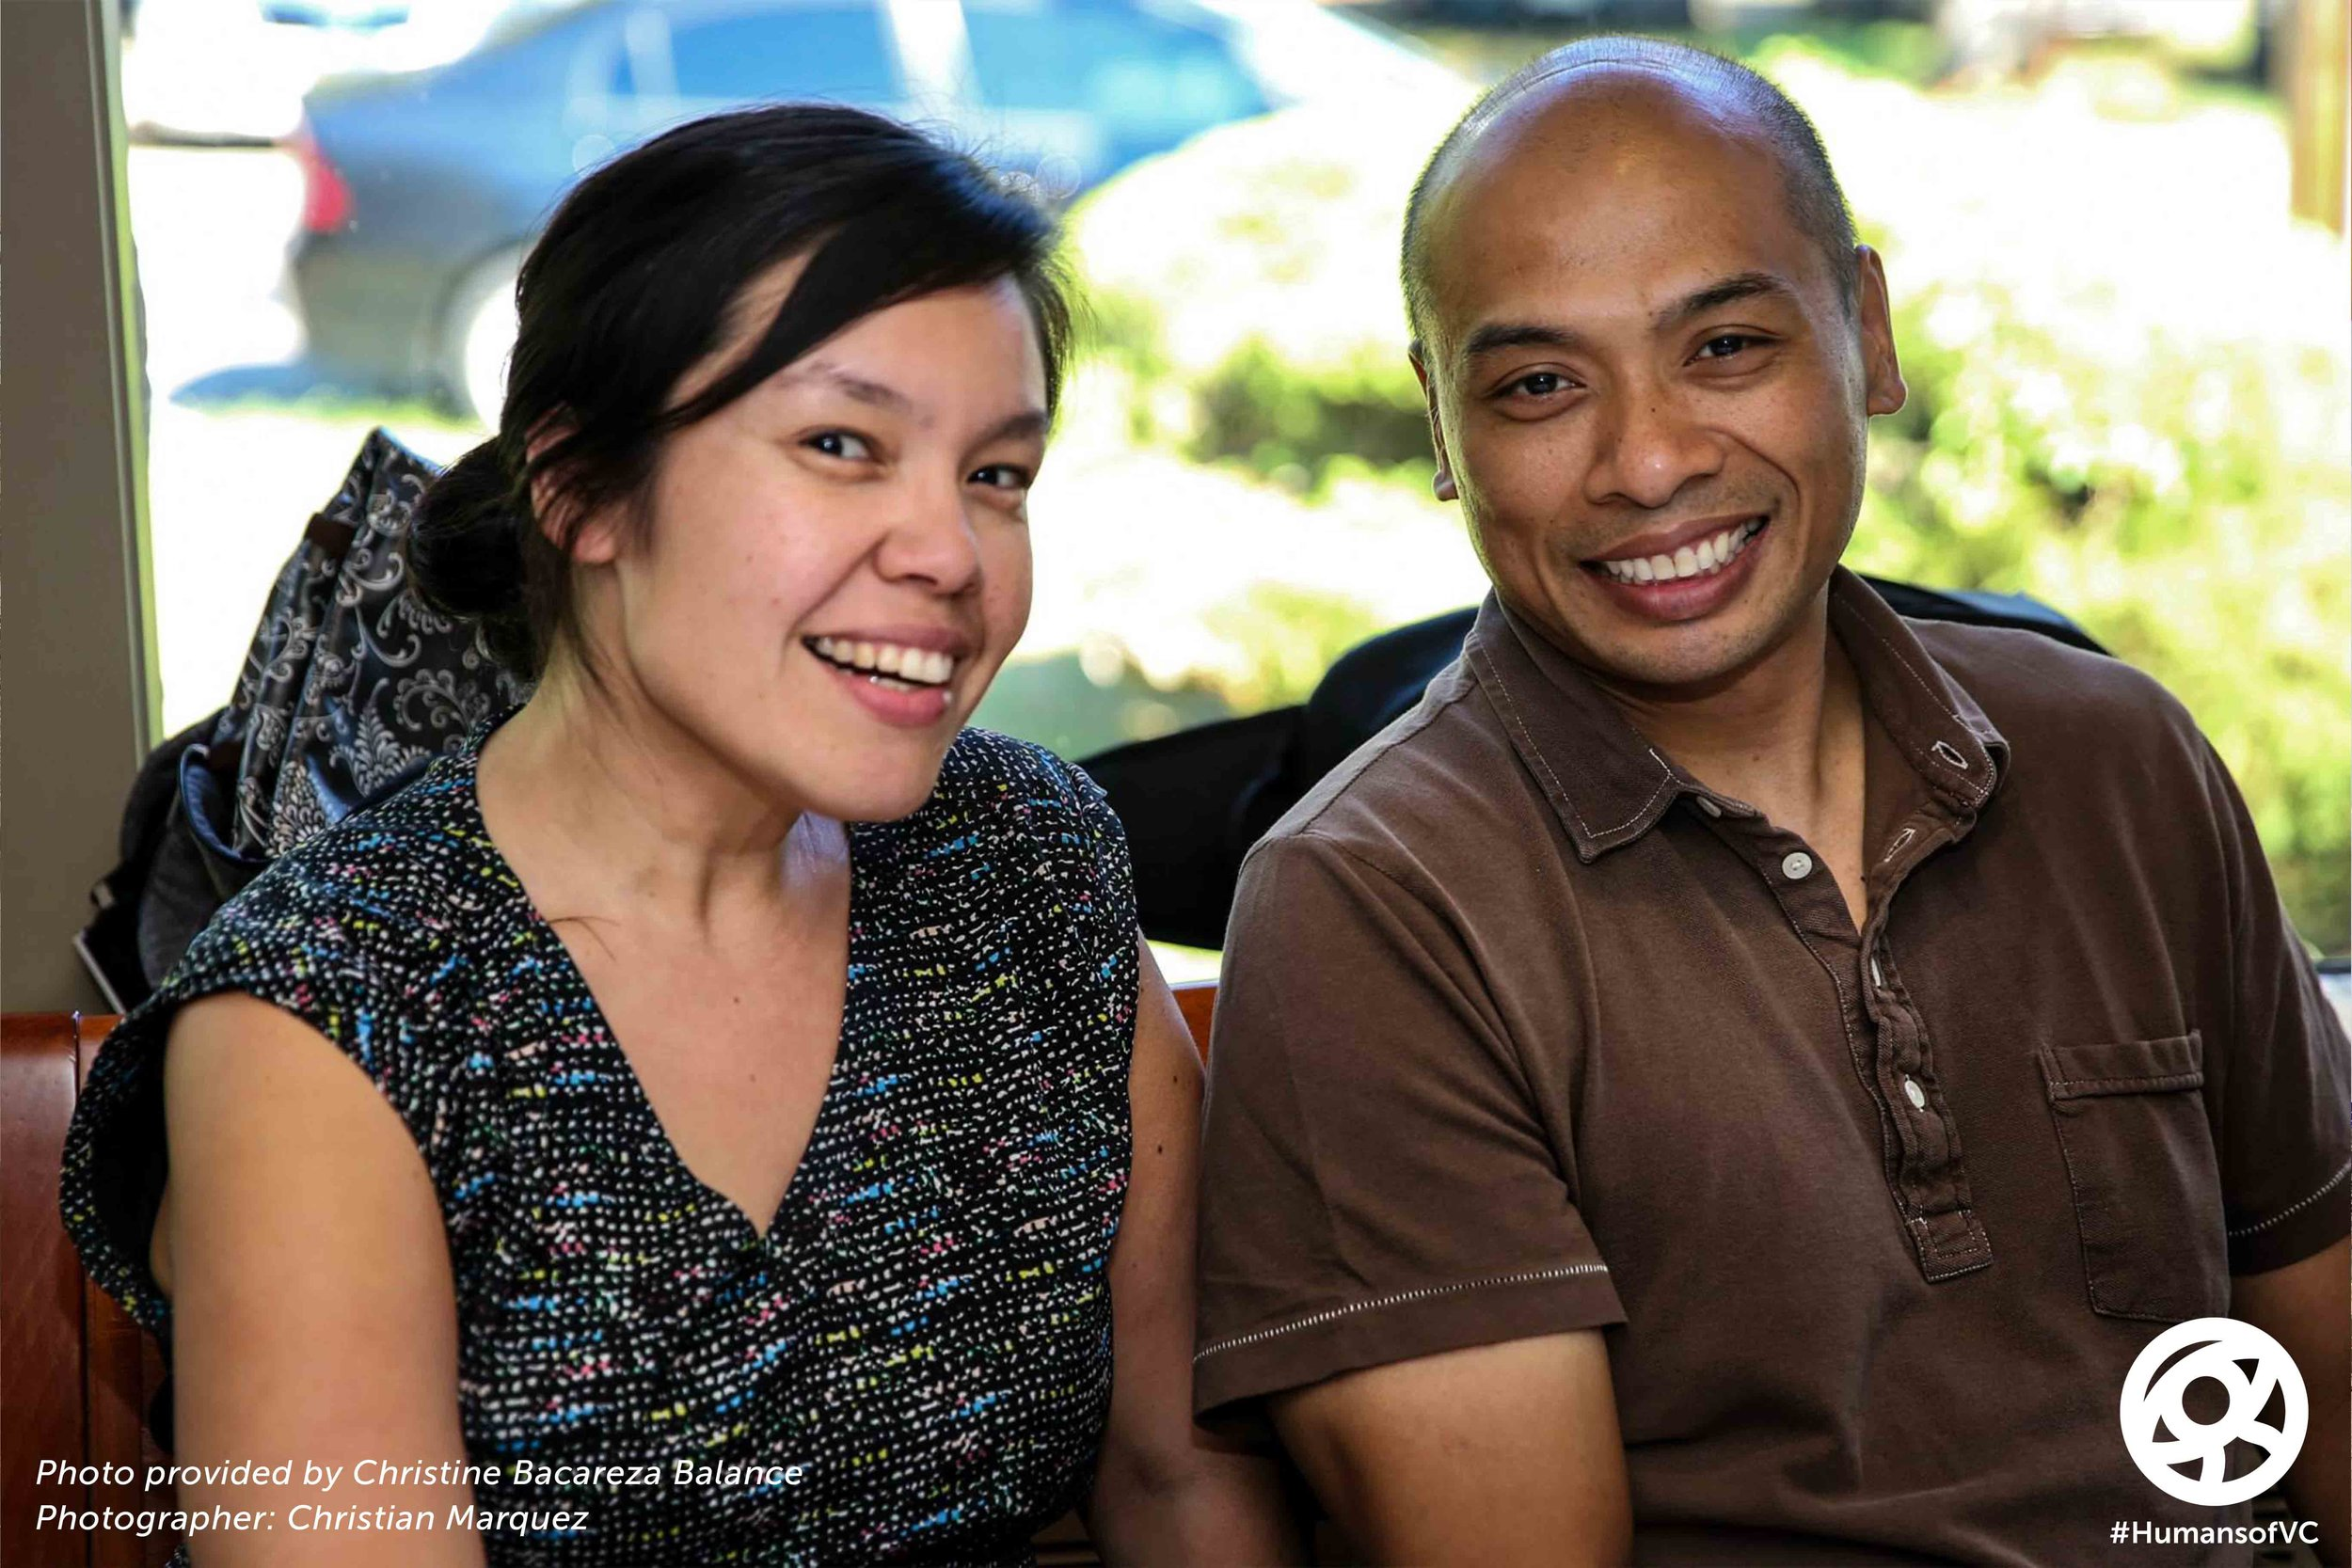 Christine Balance (UCI Professor) & Gary Gabisan (VC Staff/Filmmaker)